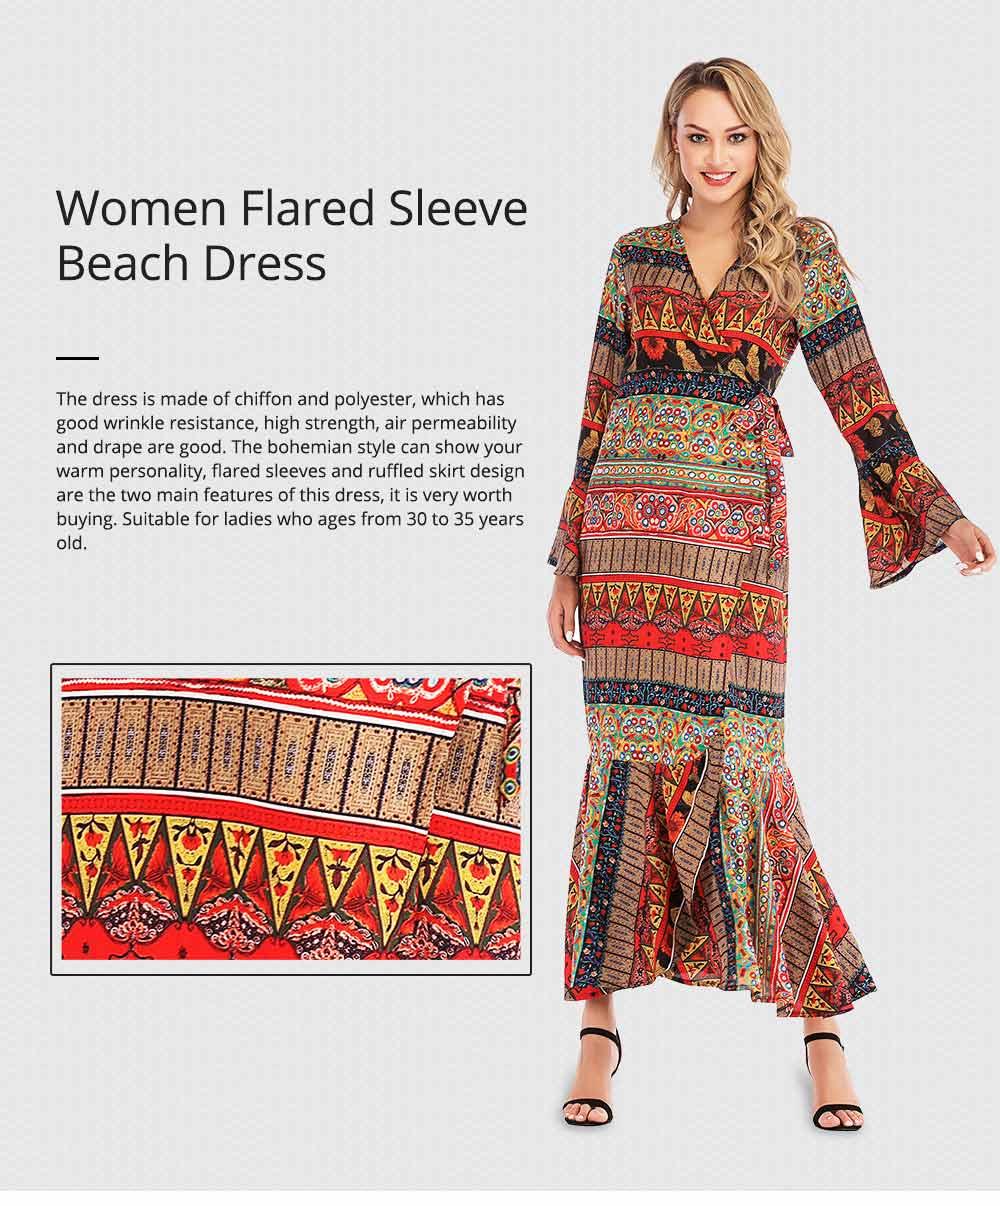 Flared Sleeve Beach Dress for Women, Women V-neck Chiffon Dress Ruffle Hem 0